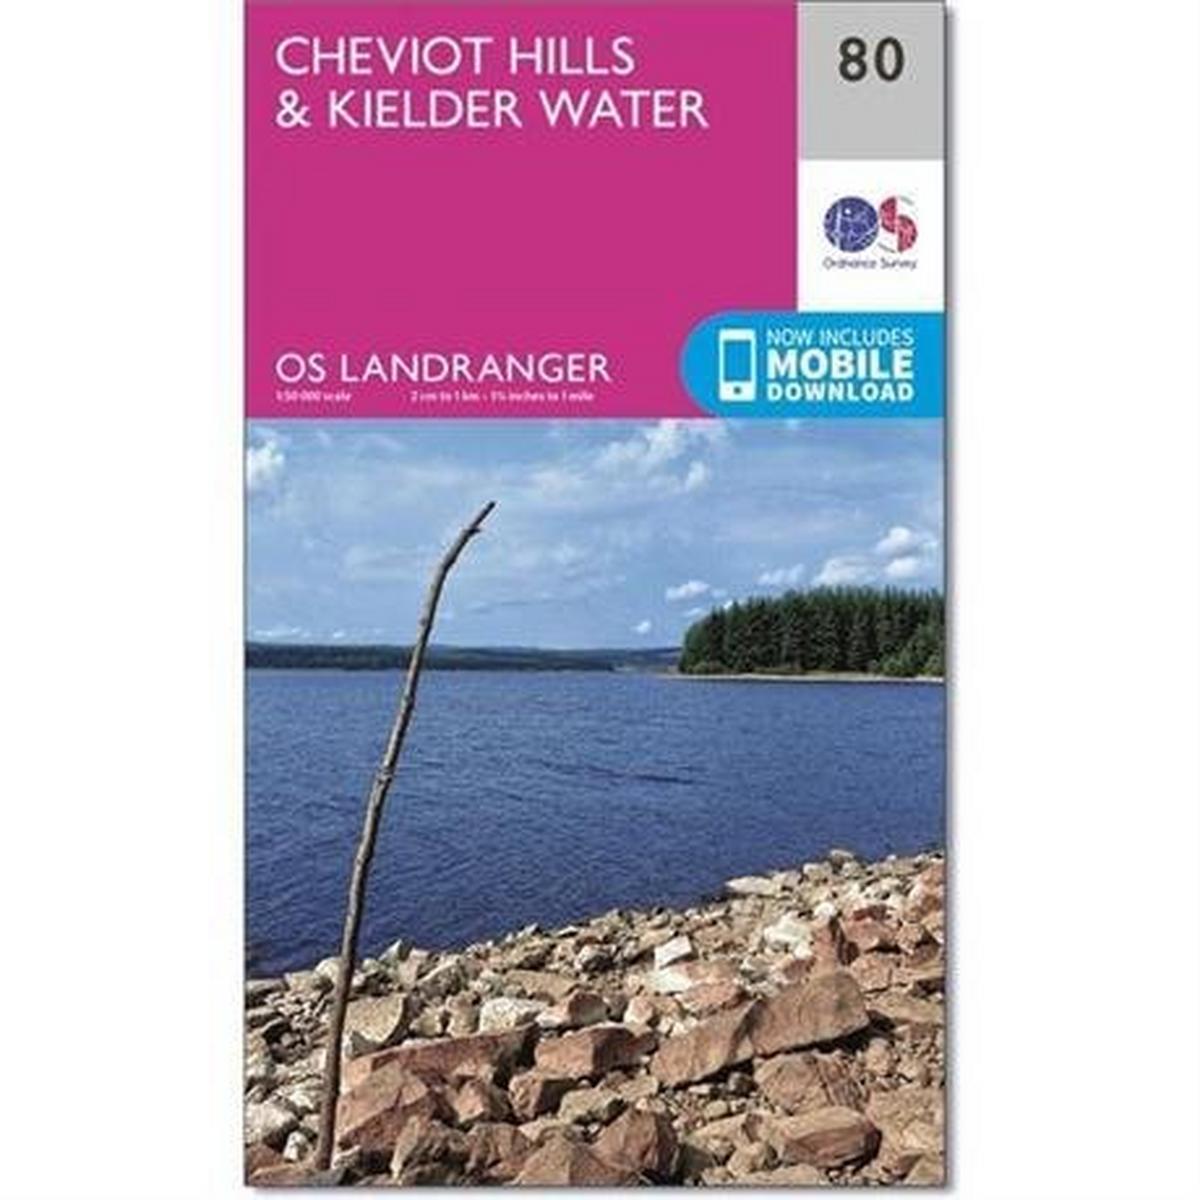 Ordnance Survey OS Landranger Map 80 Cheviot Hills & Kielder Water